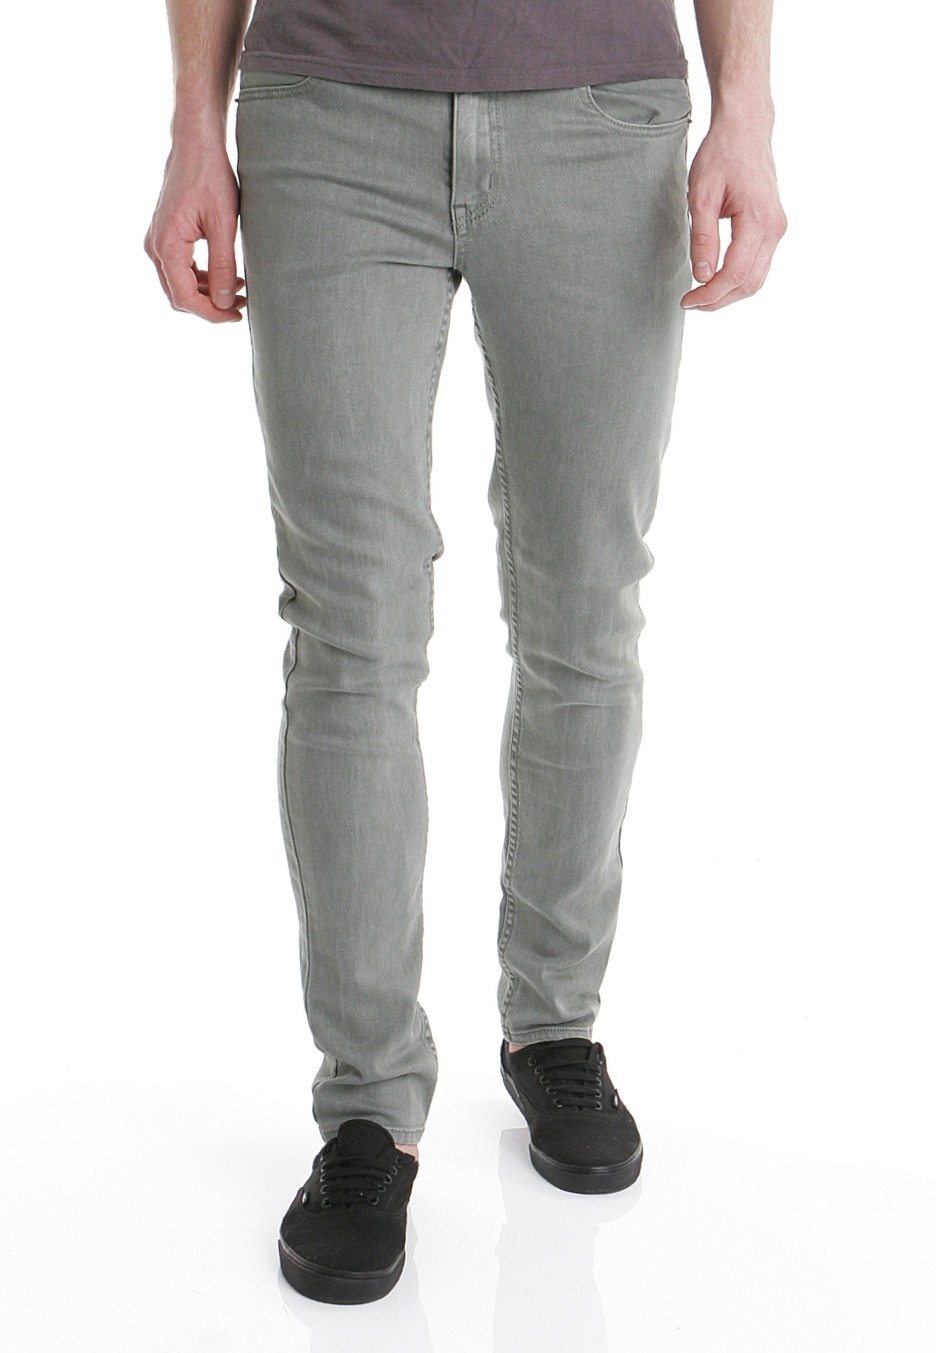 cheap monday  tight slate grey  jeans  impericon uk